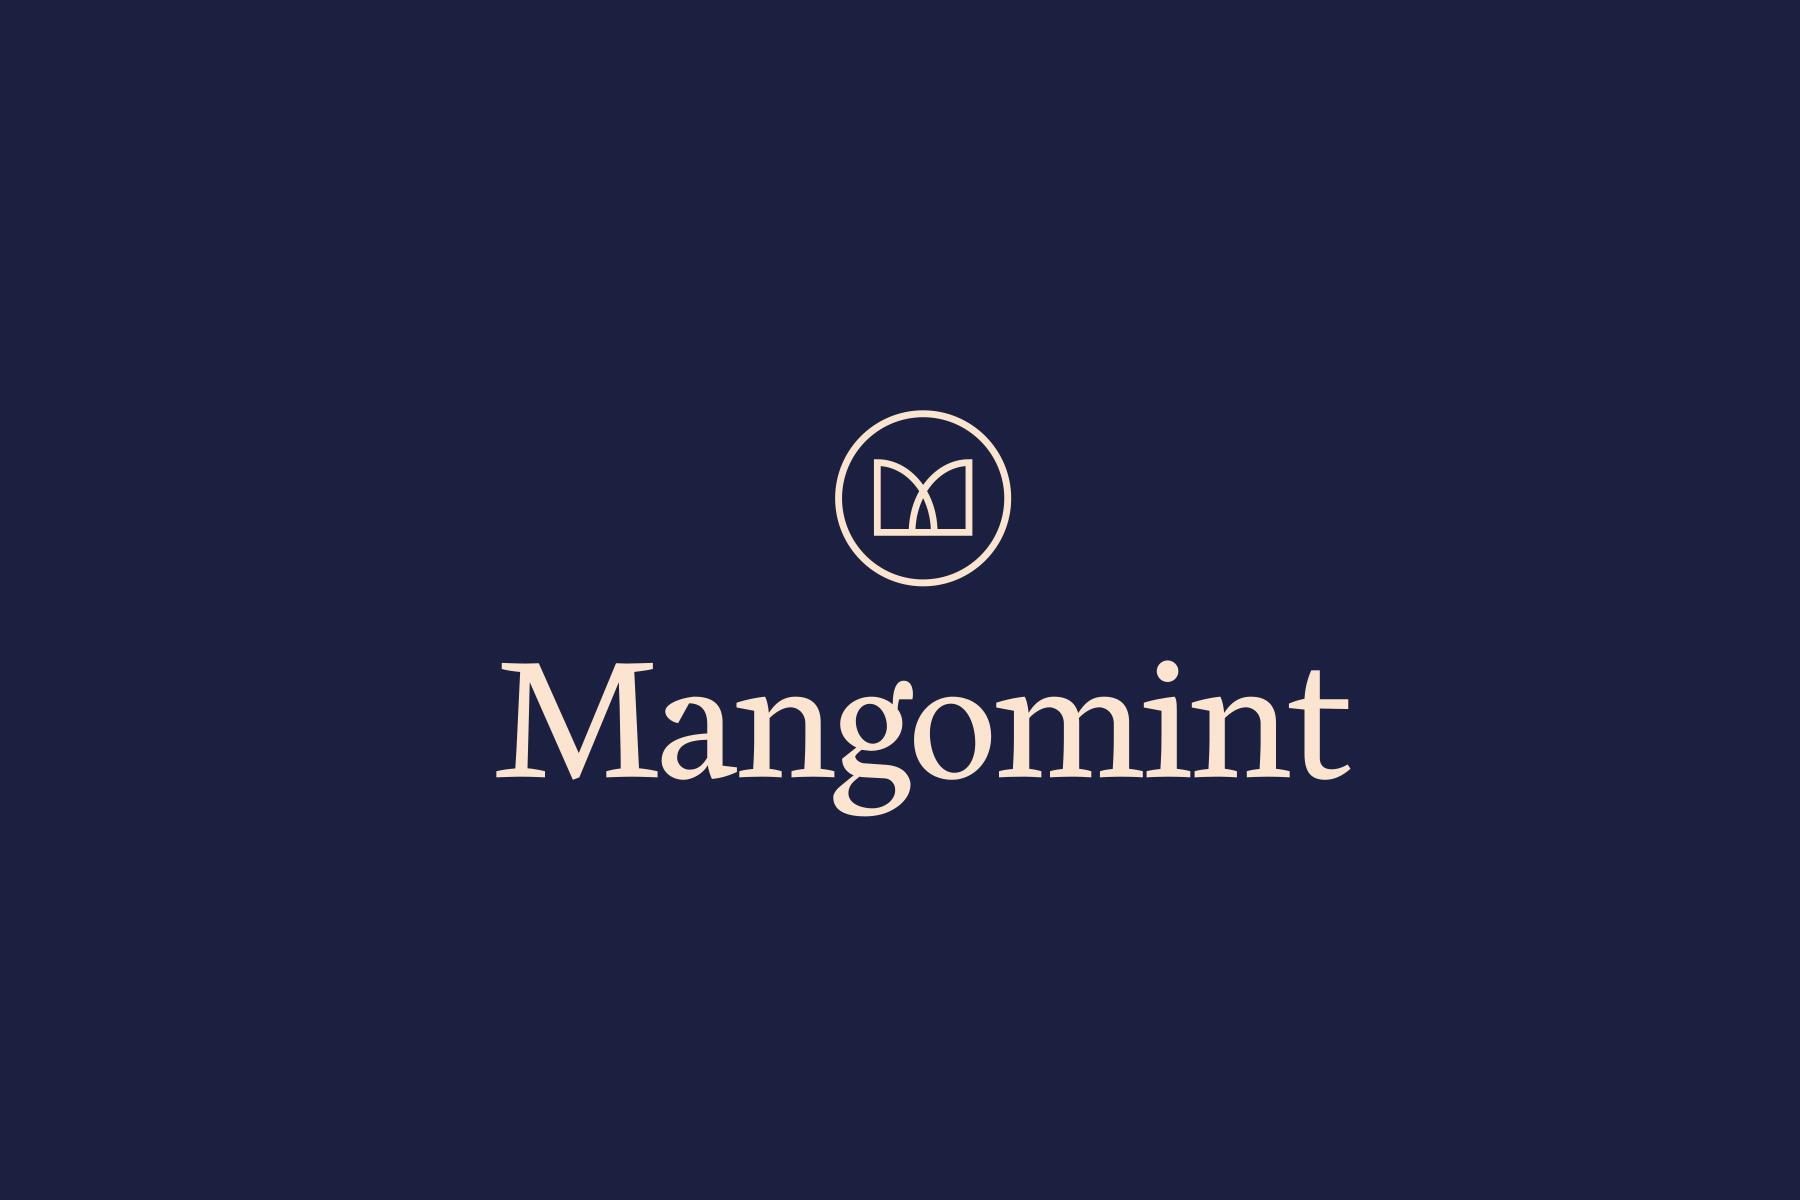 Mangomint_Logo_1.jpg